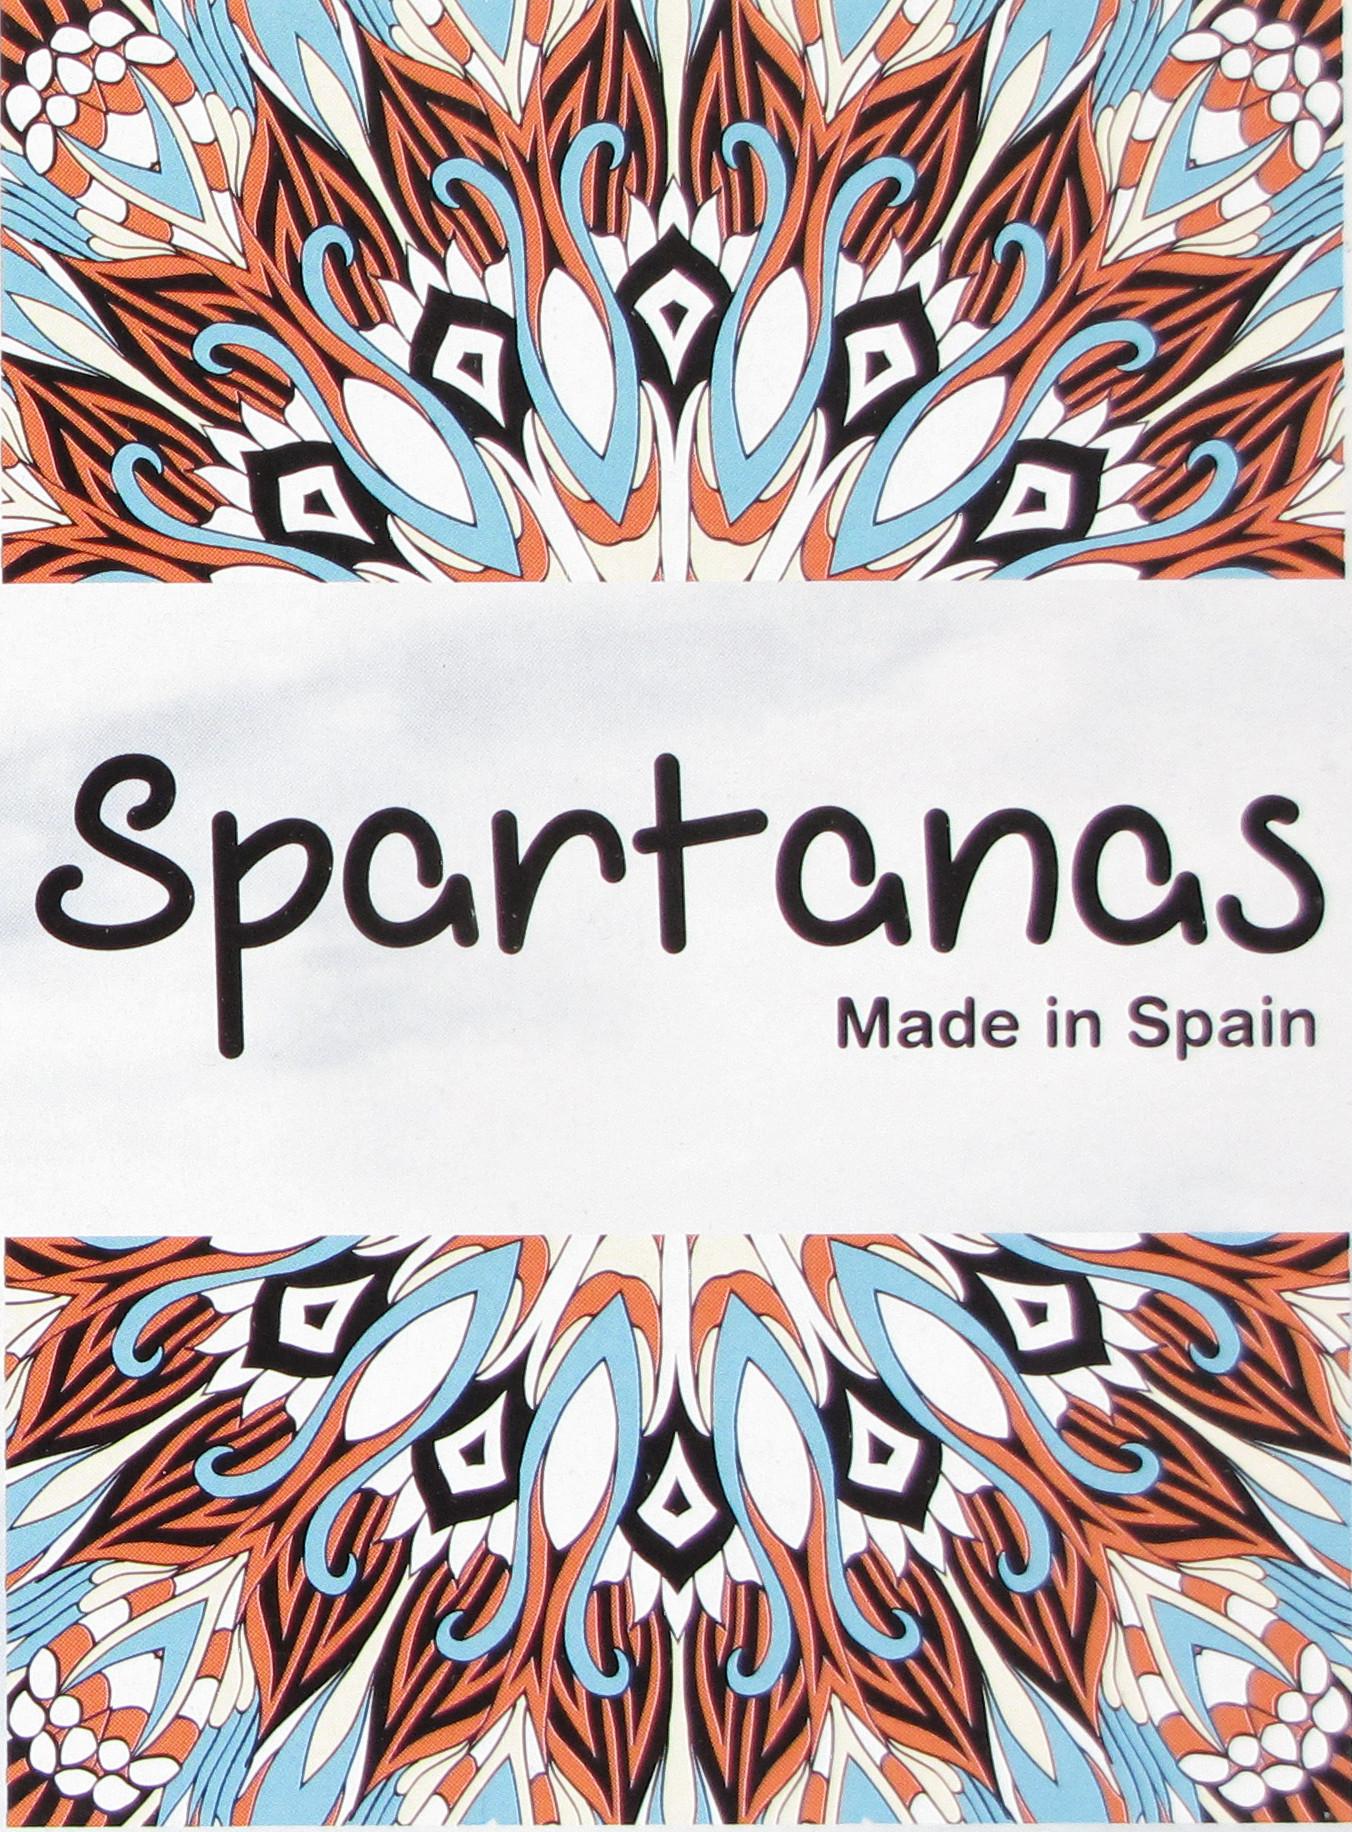 Spartanas